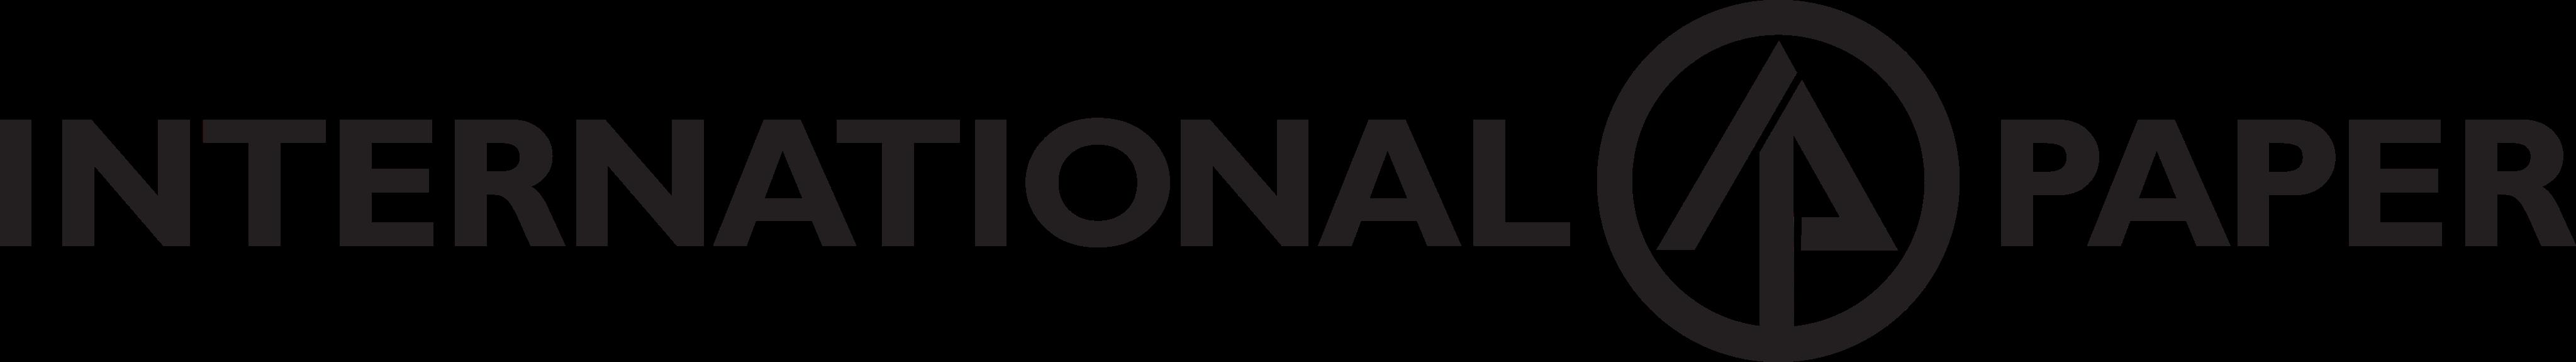 International Paper Logo.